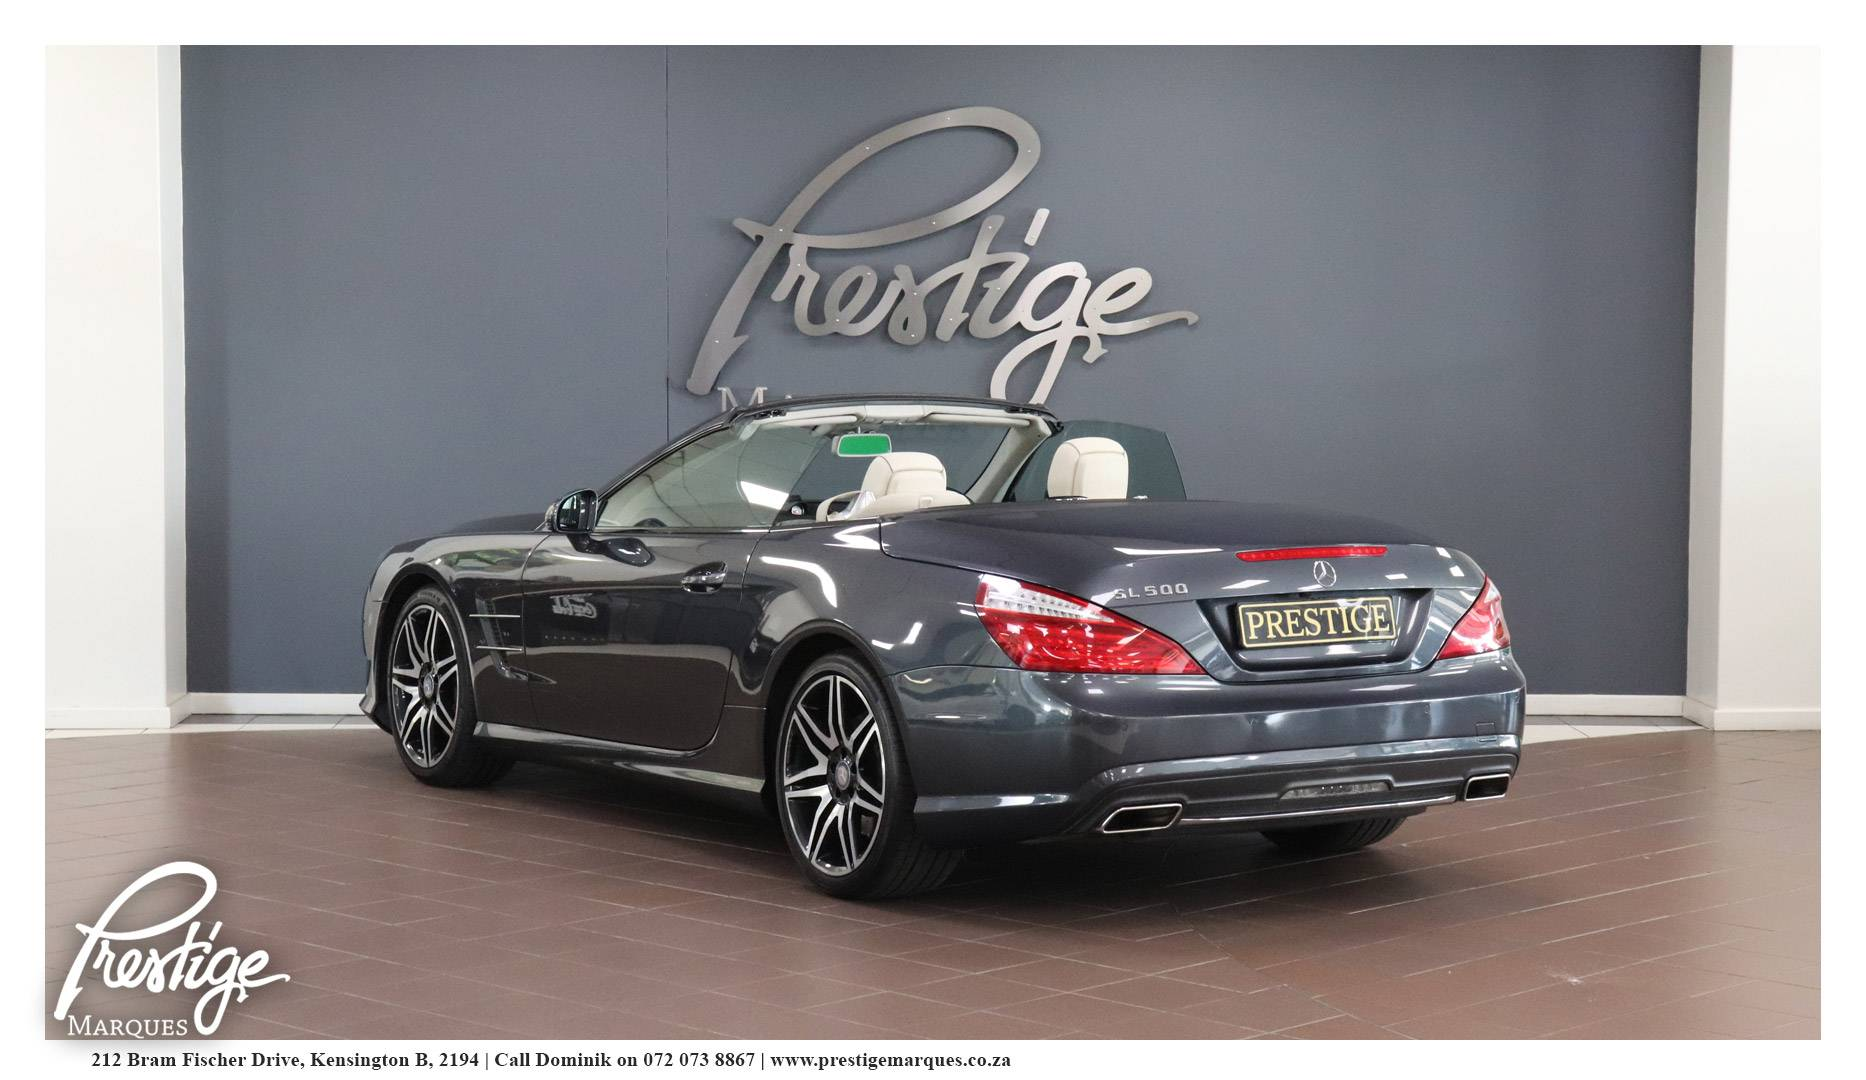 2014-Merc-SL-500-AMG-Grey-Prestige-MArques-Sandton-Randburg-10